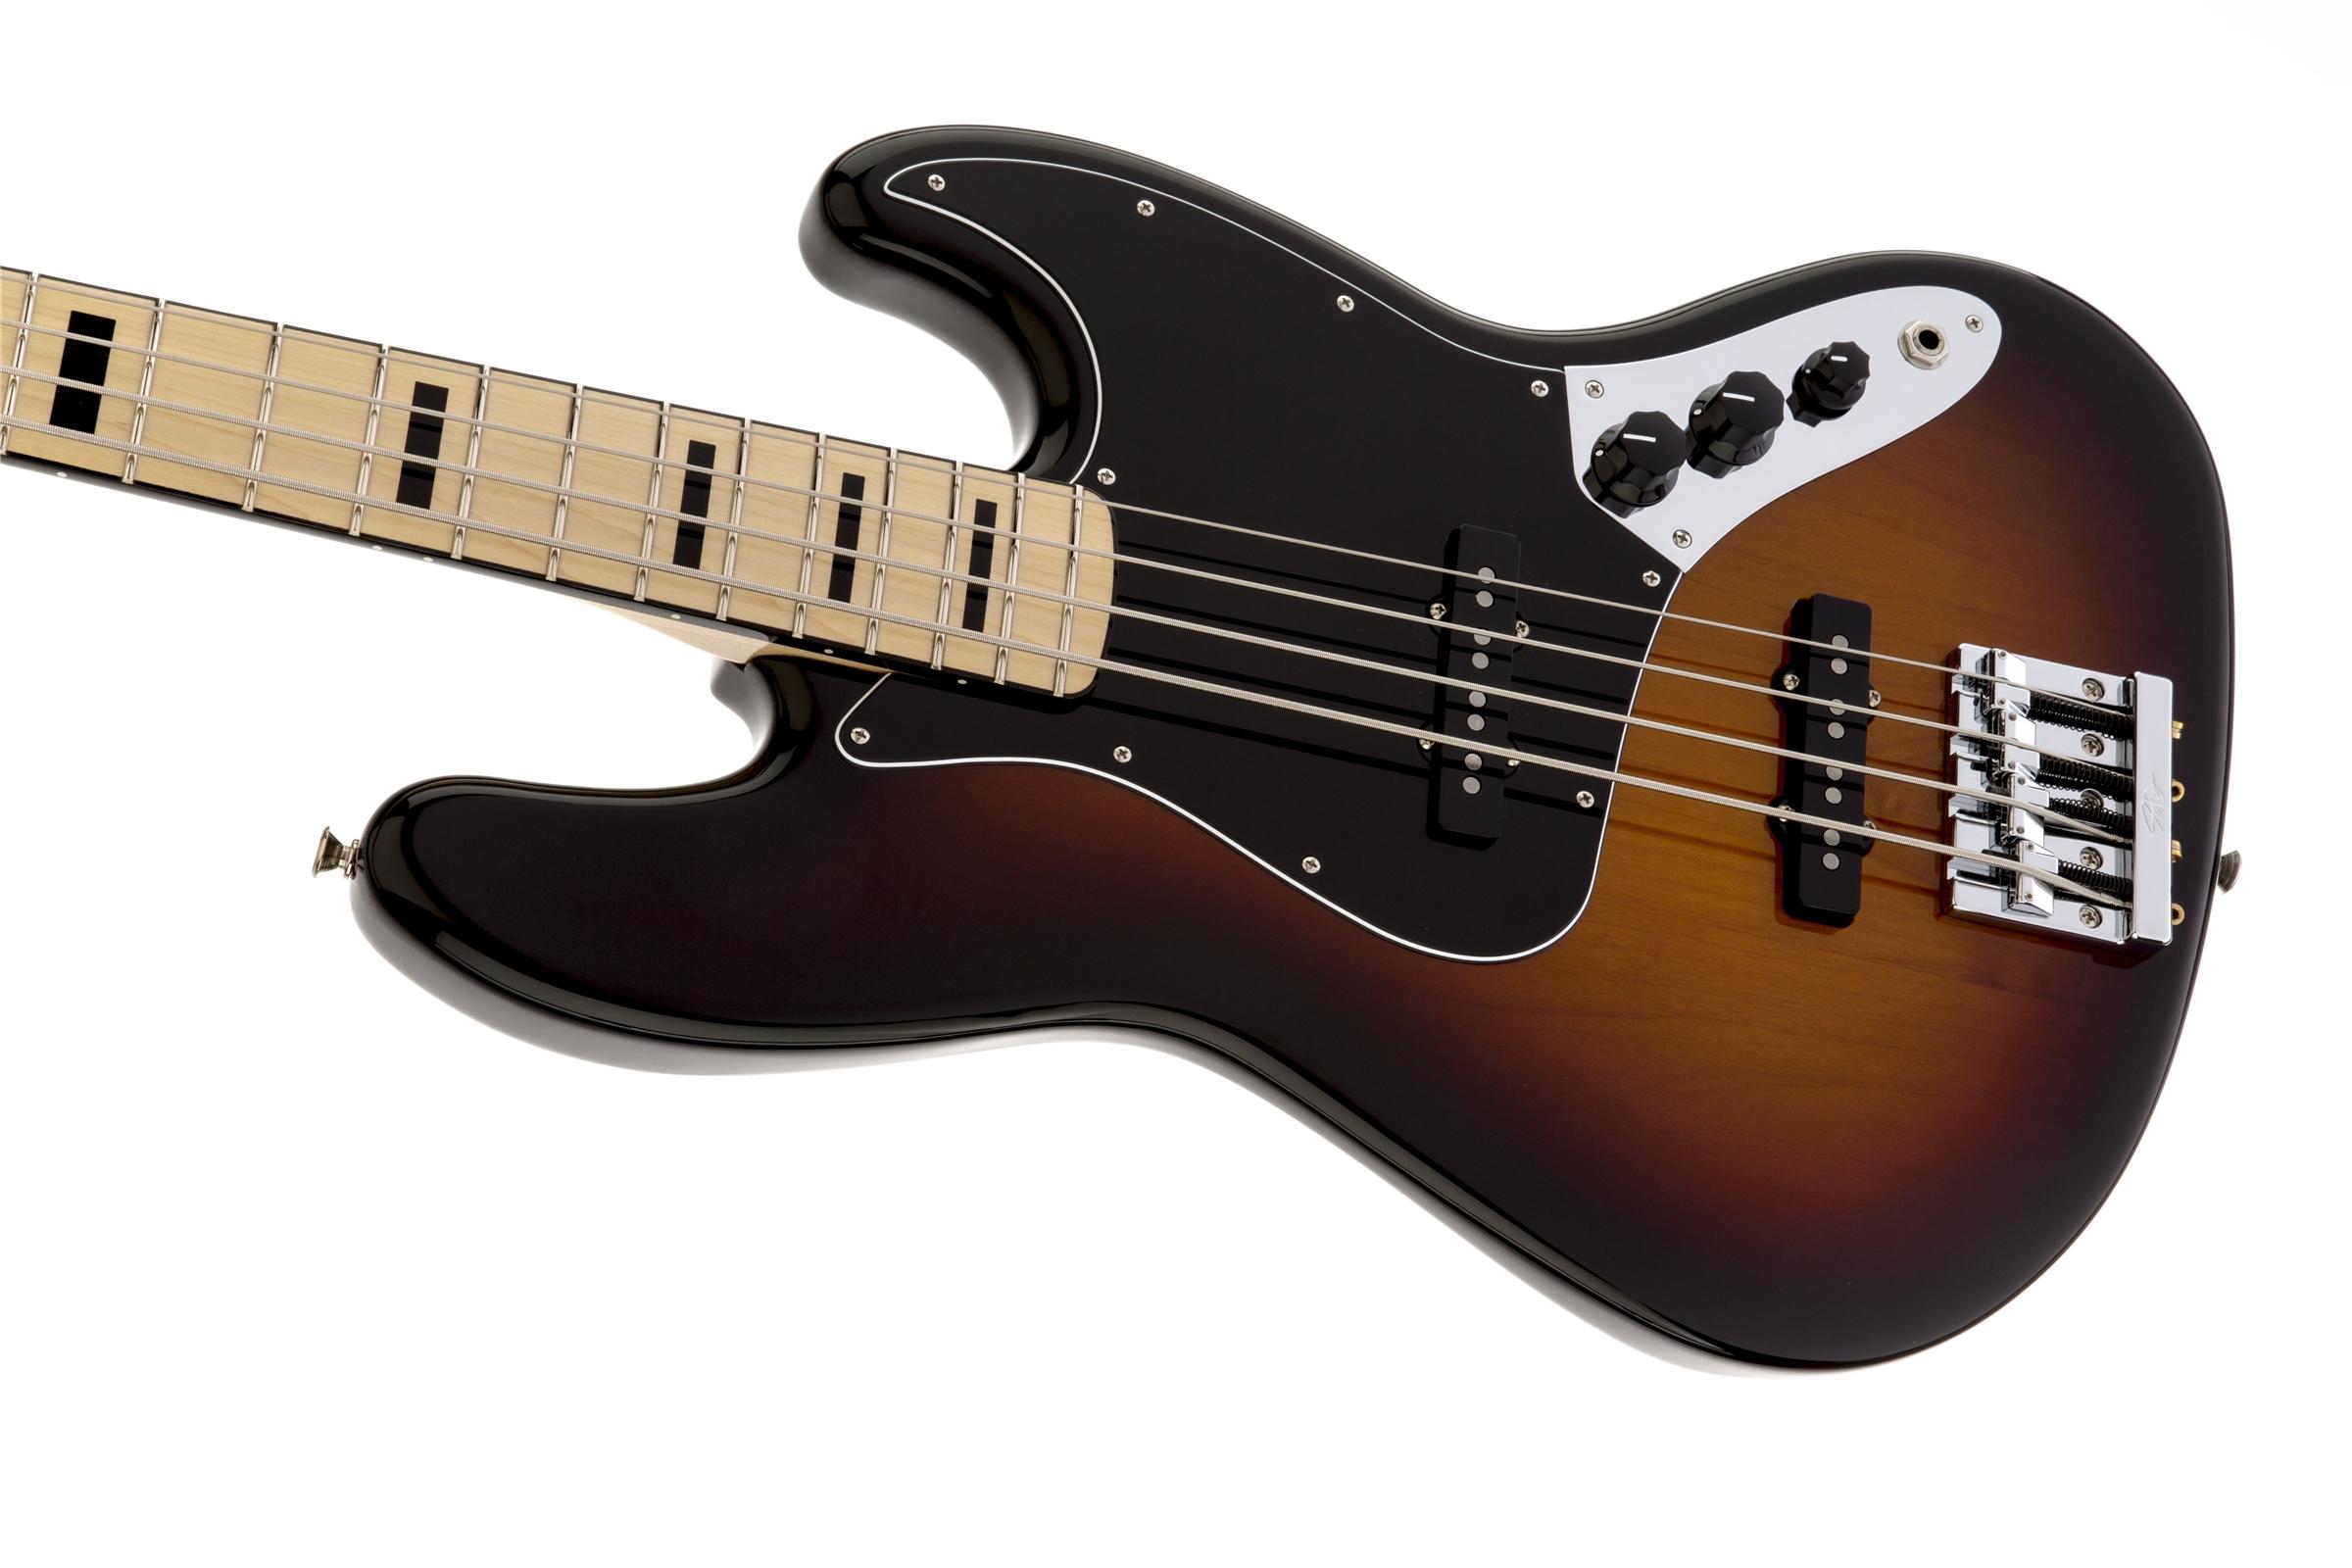 DIAGRAM] Fender American Jazz Bass Wiring Diagram FULL Version HD Quality Wiring  Diagram - CORONADELVISTA.DATAJOB2013.FRcoronadelvista.datajob2013.fr